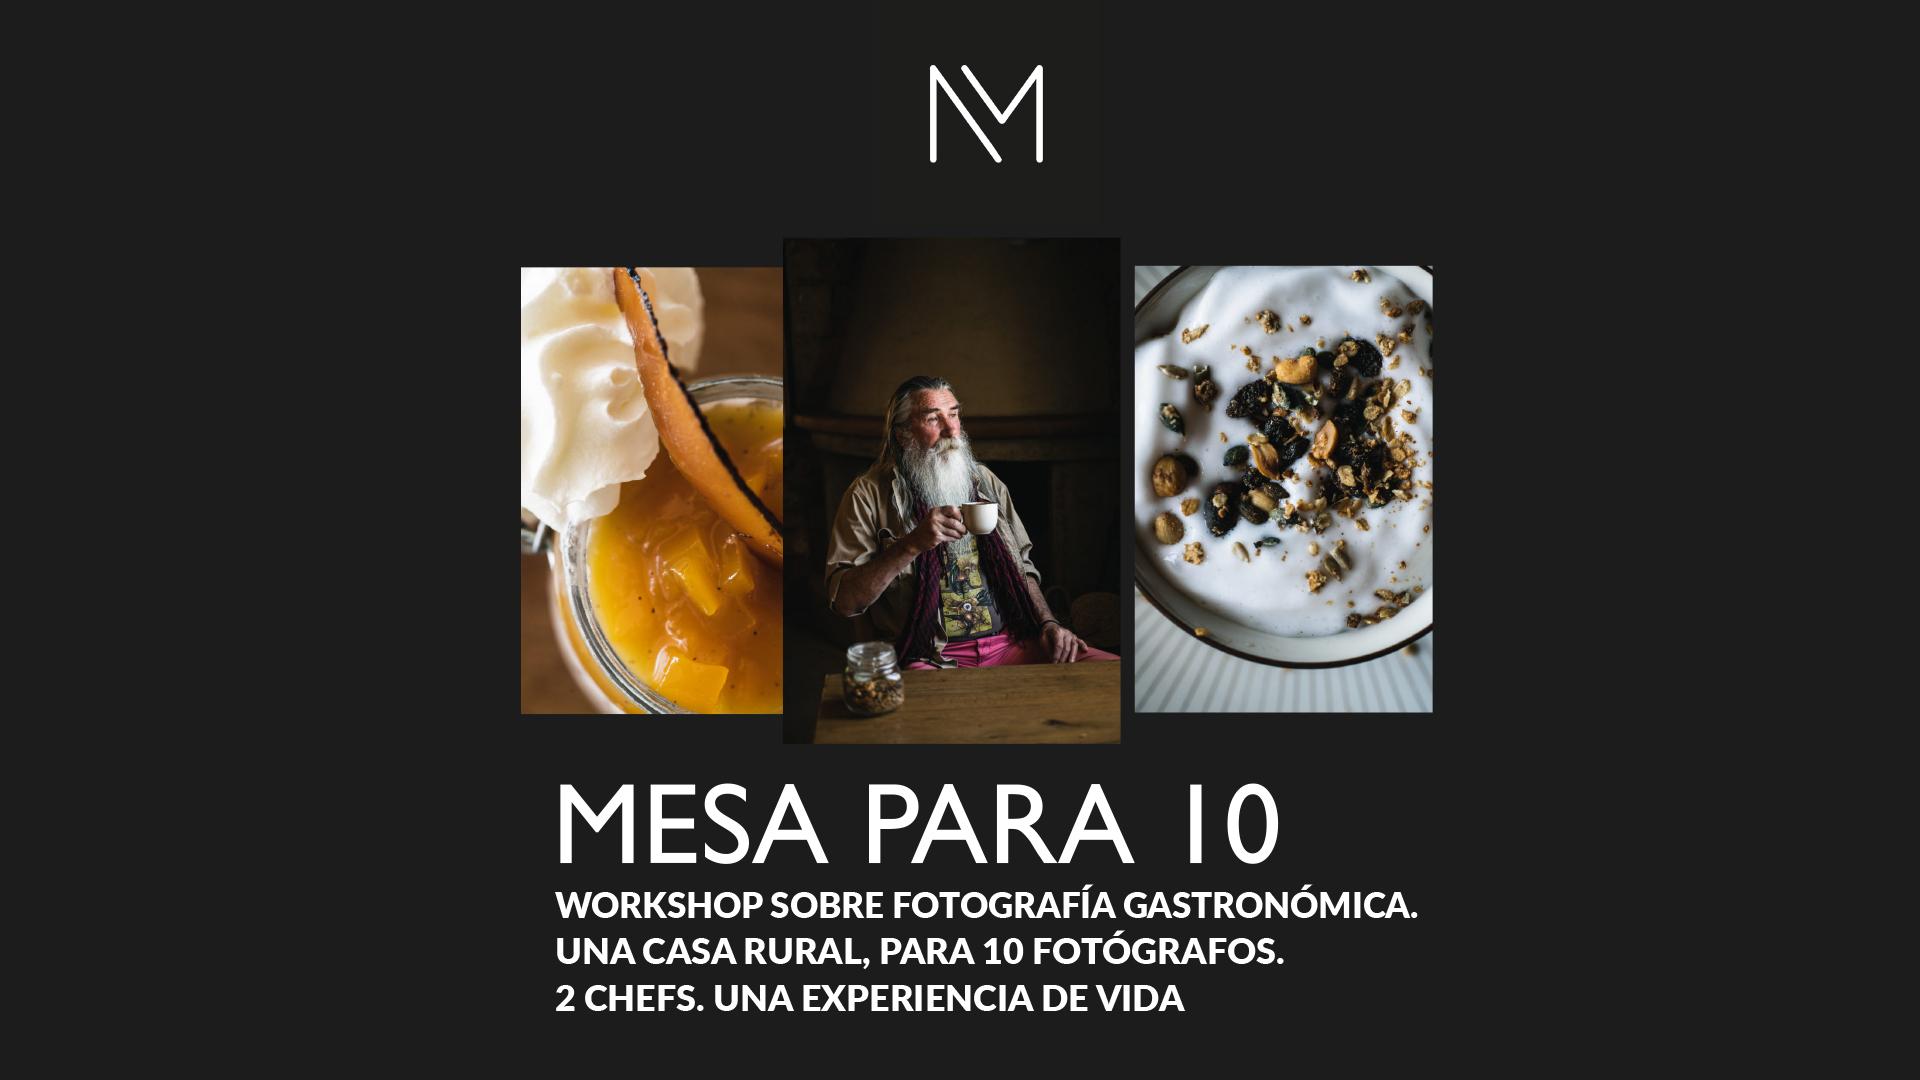 Formacion fotografia gastronomica, workshop foto, one to one, curso foto gastronomica, mesa para 10 curso